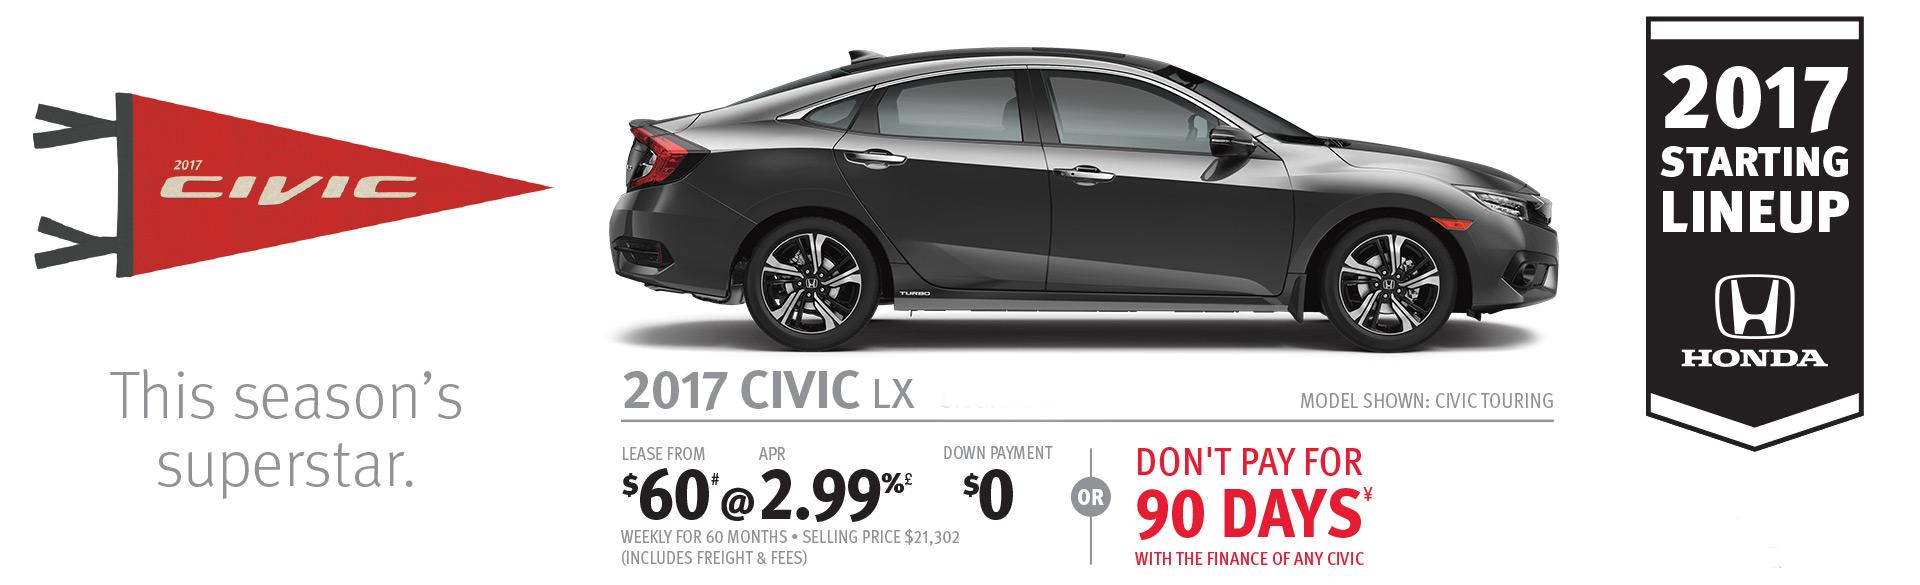 2017 Honda Civic Deal